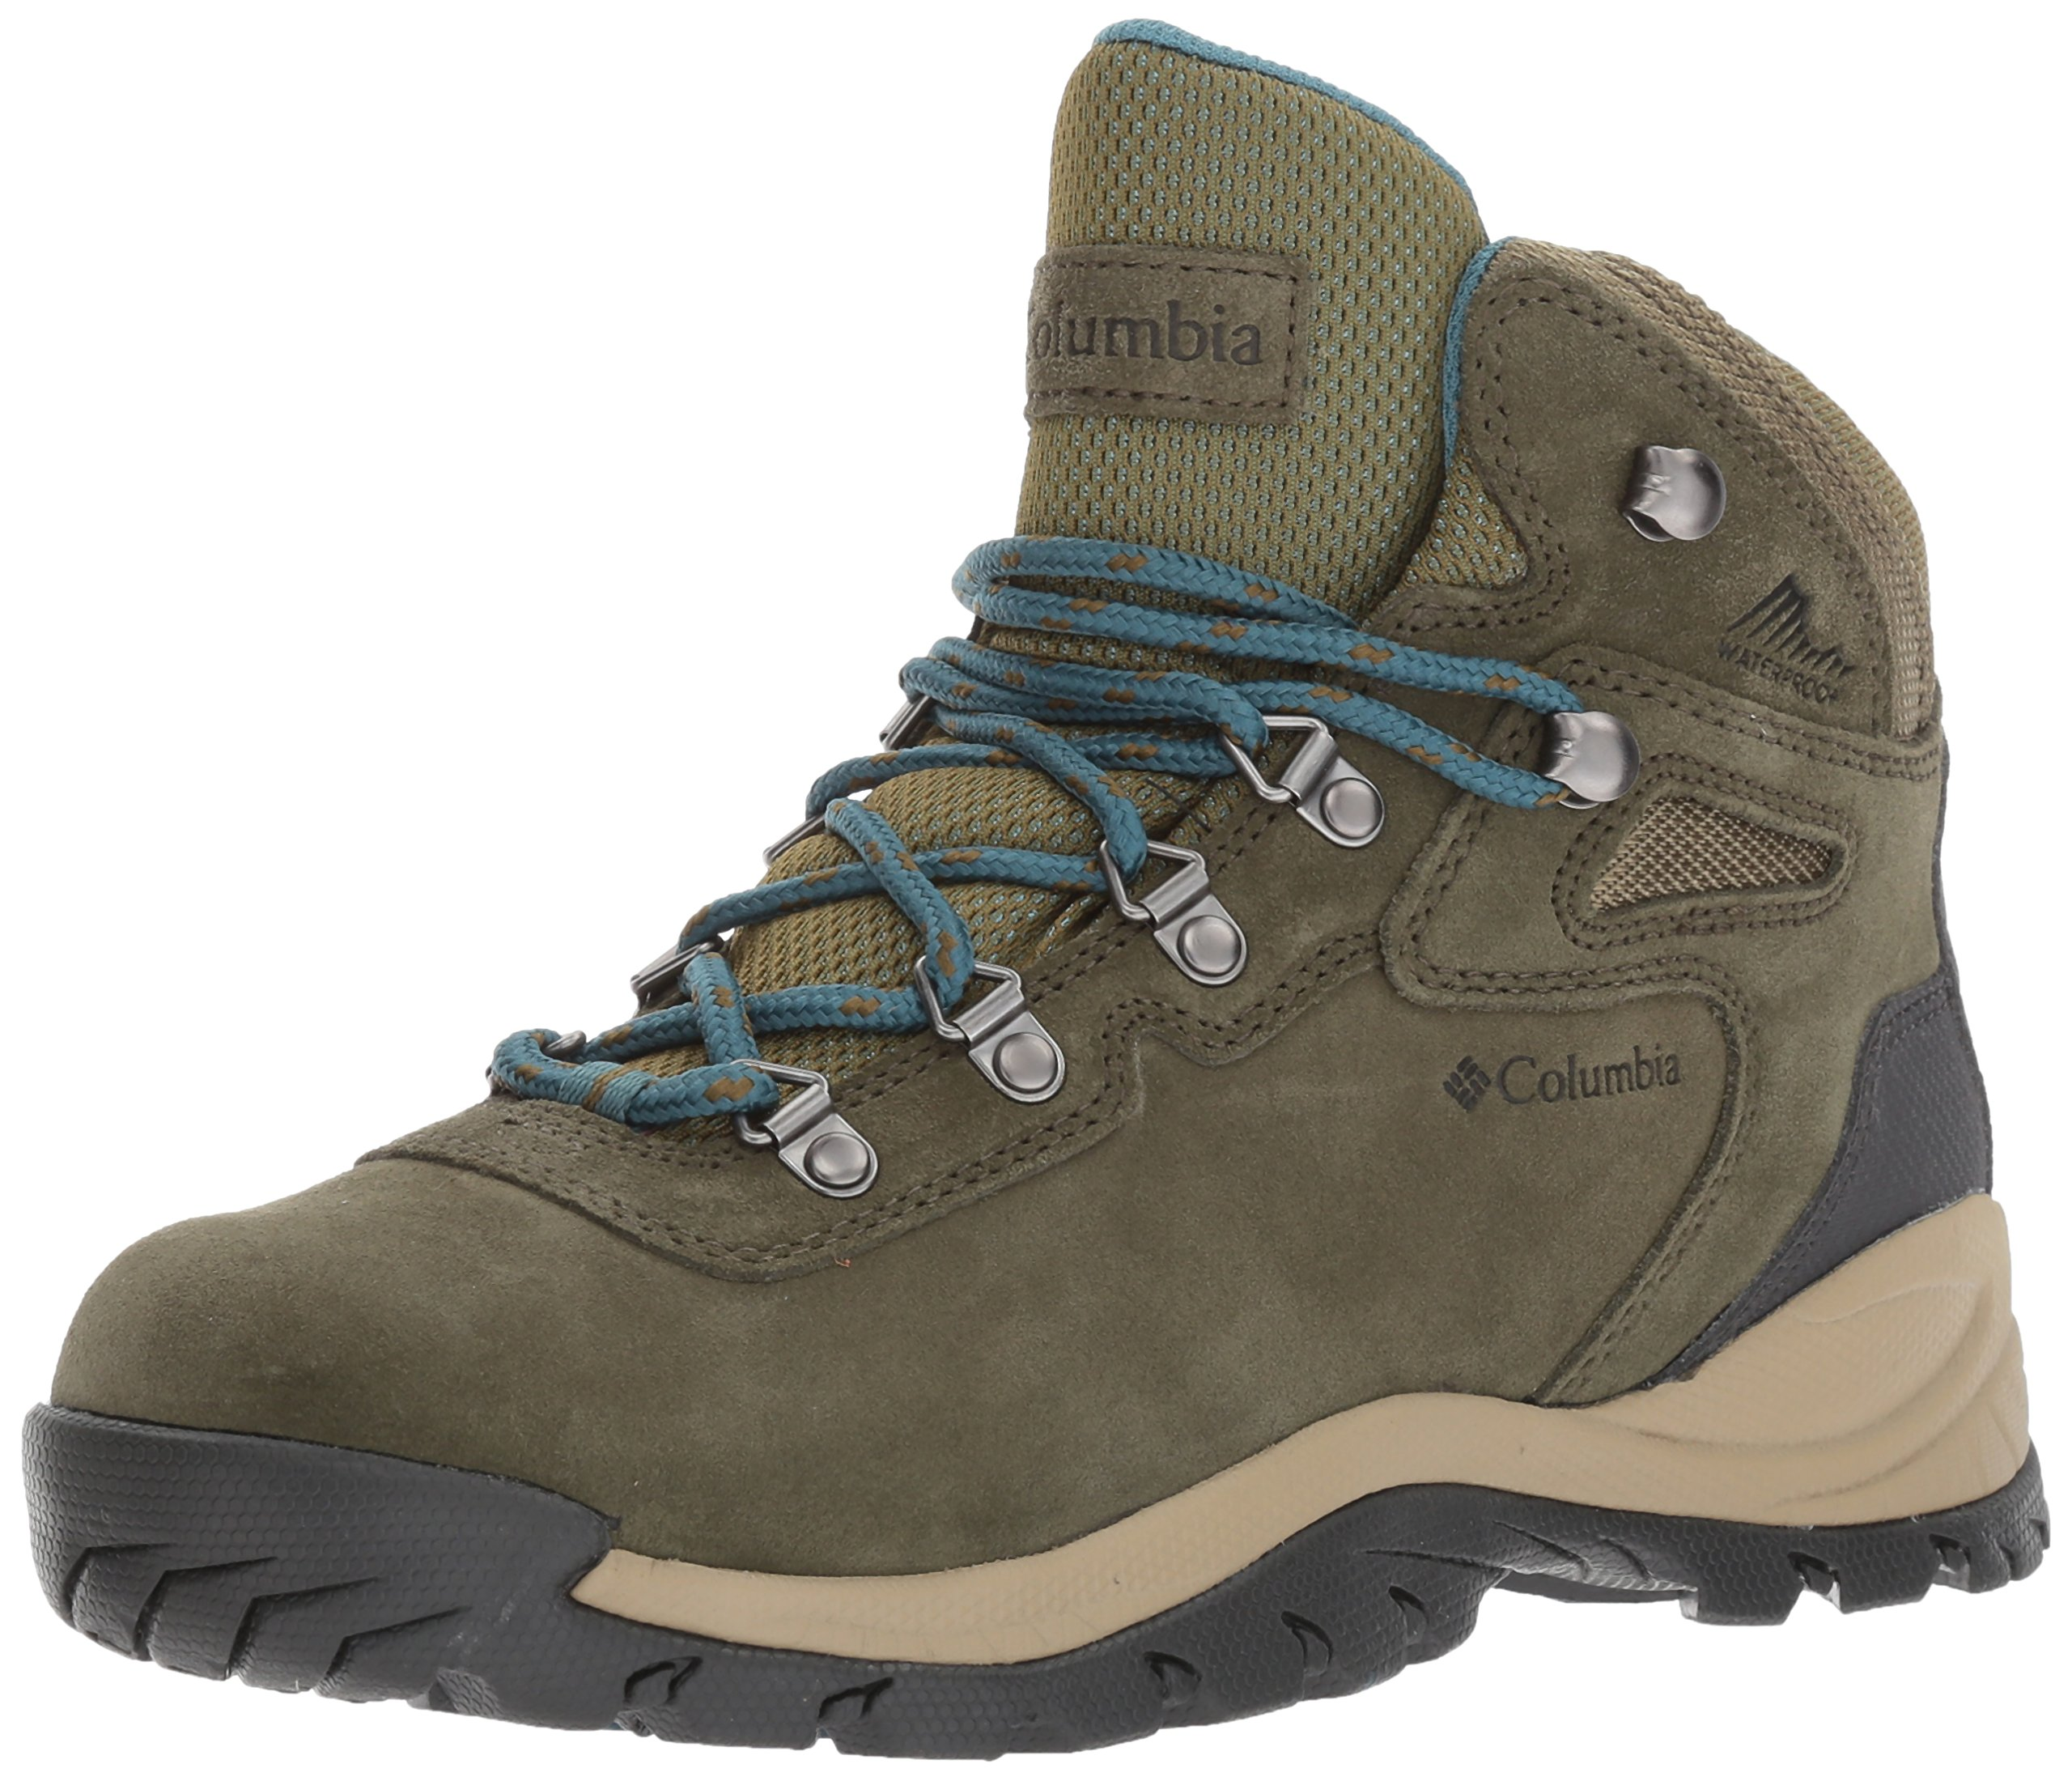 Columbia Women's Newton Ridge Plus Waterproof Amped Hiking Boot Nori/Cloudburst 6 Regular US